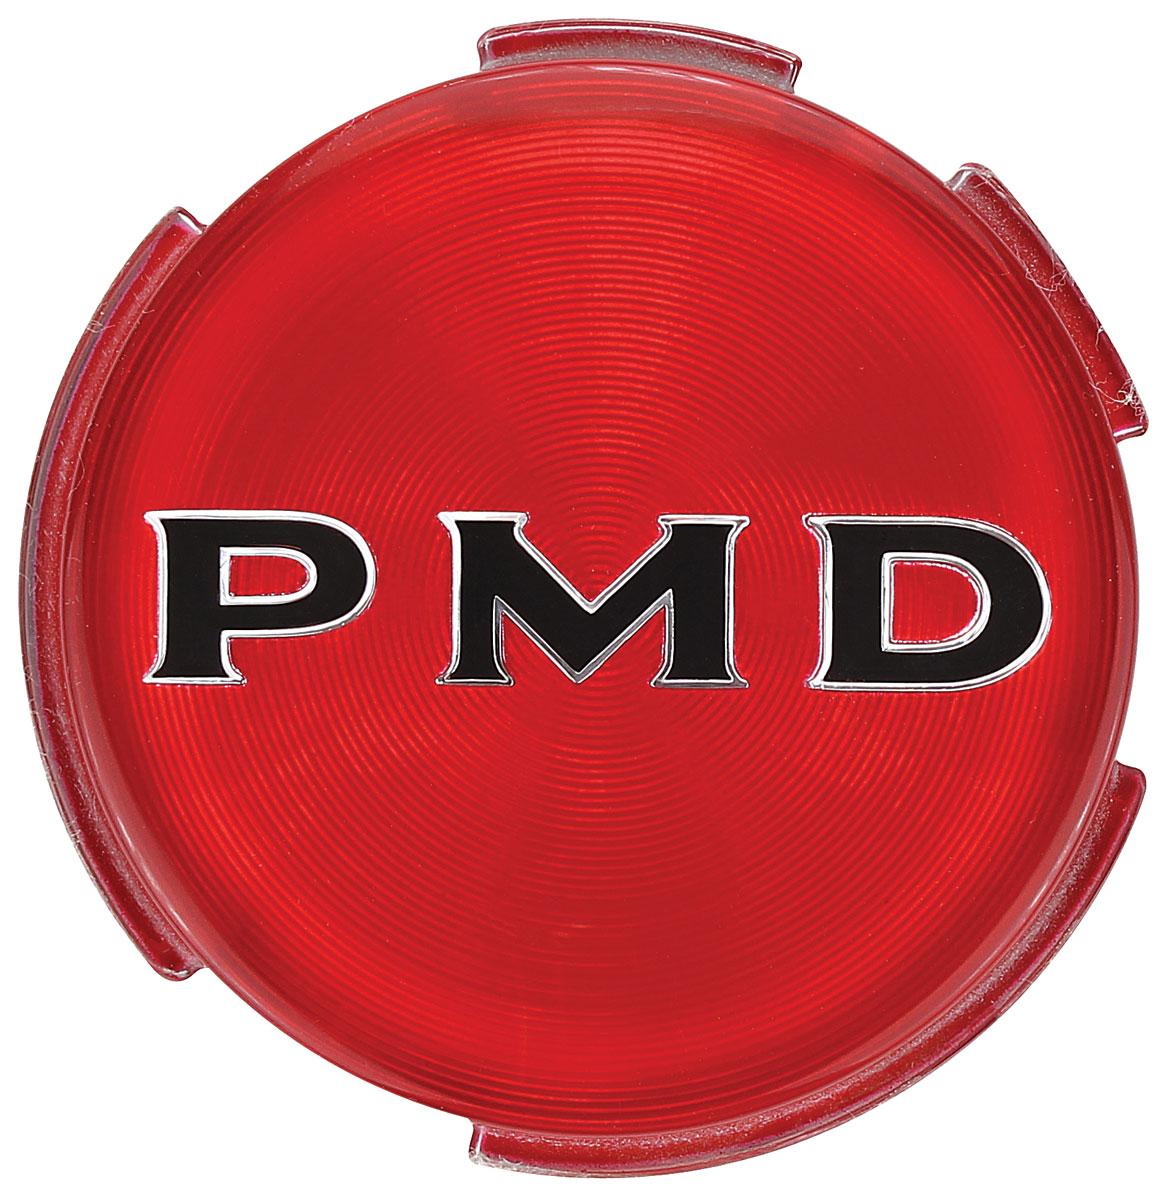 Emblem, Wheel, 1967-70 Pontiac, Red 2-3/4